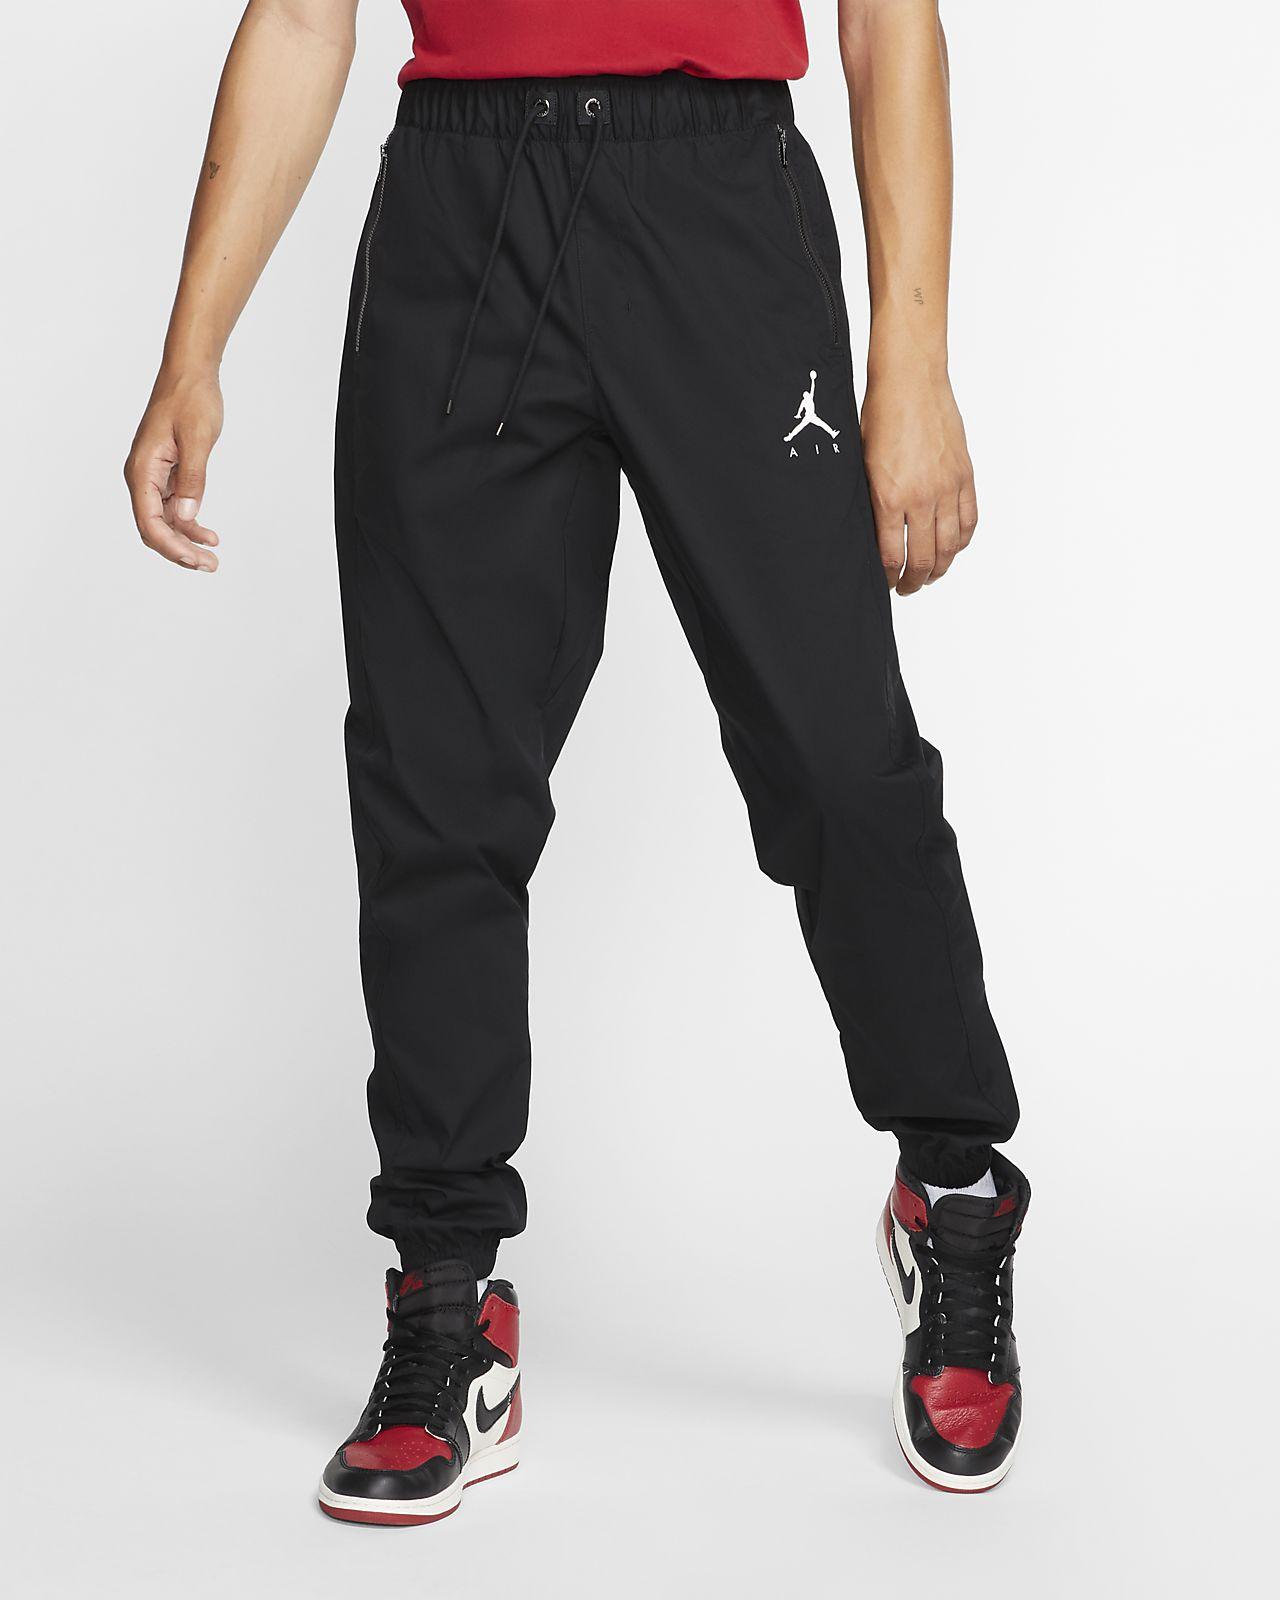 Jordan Jumpman 梭織運動褲